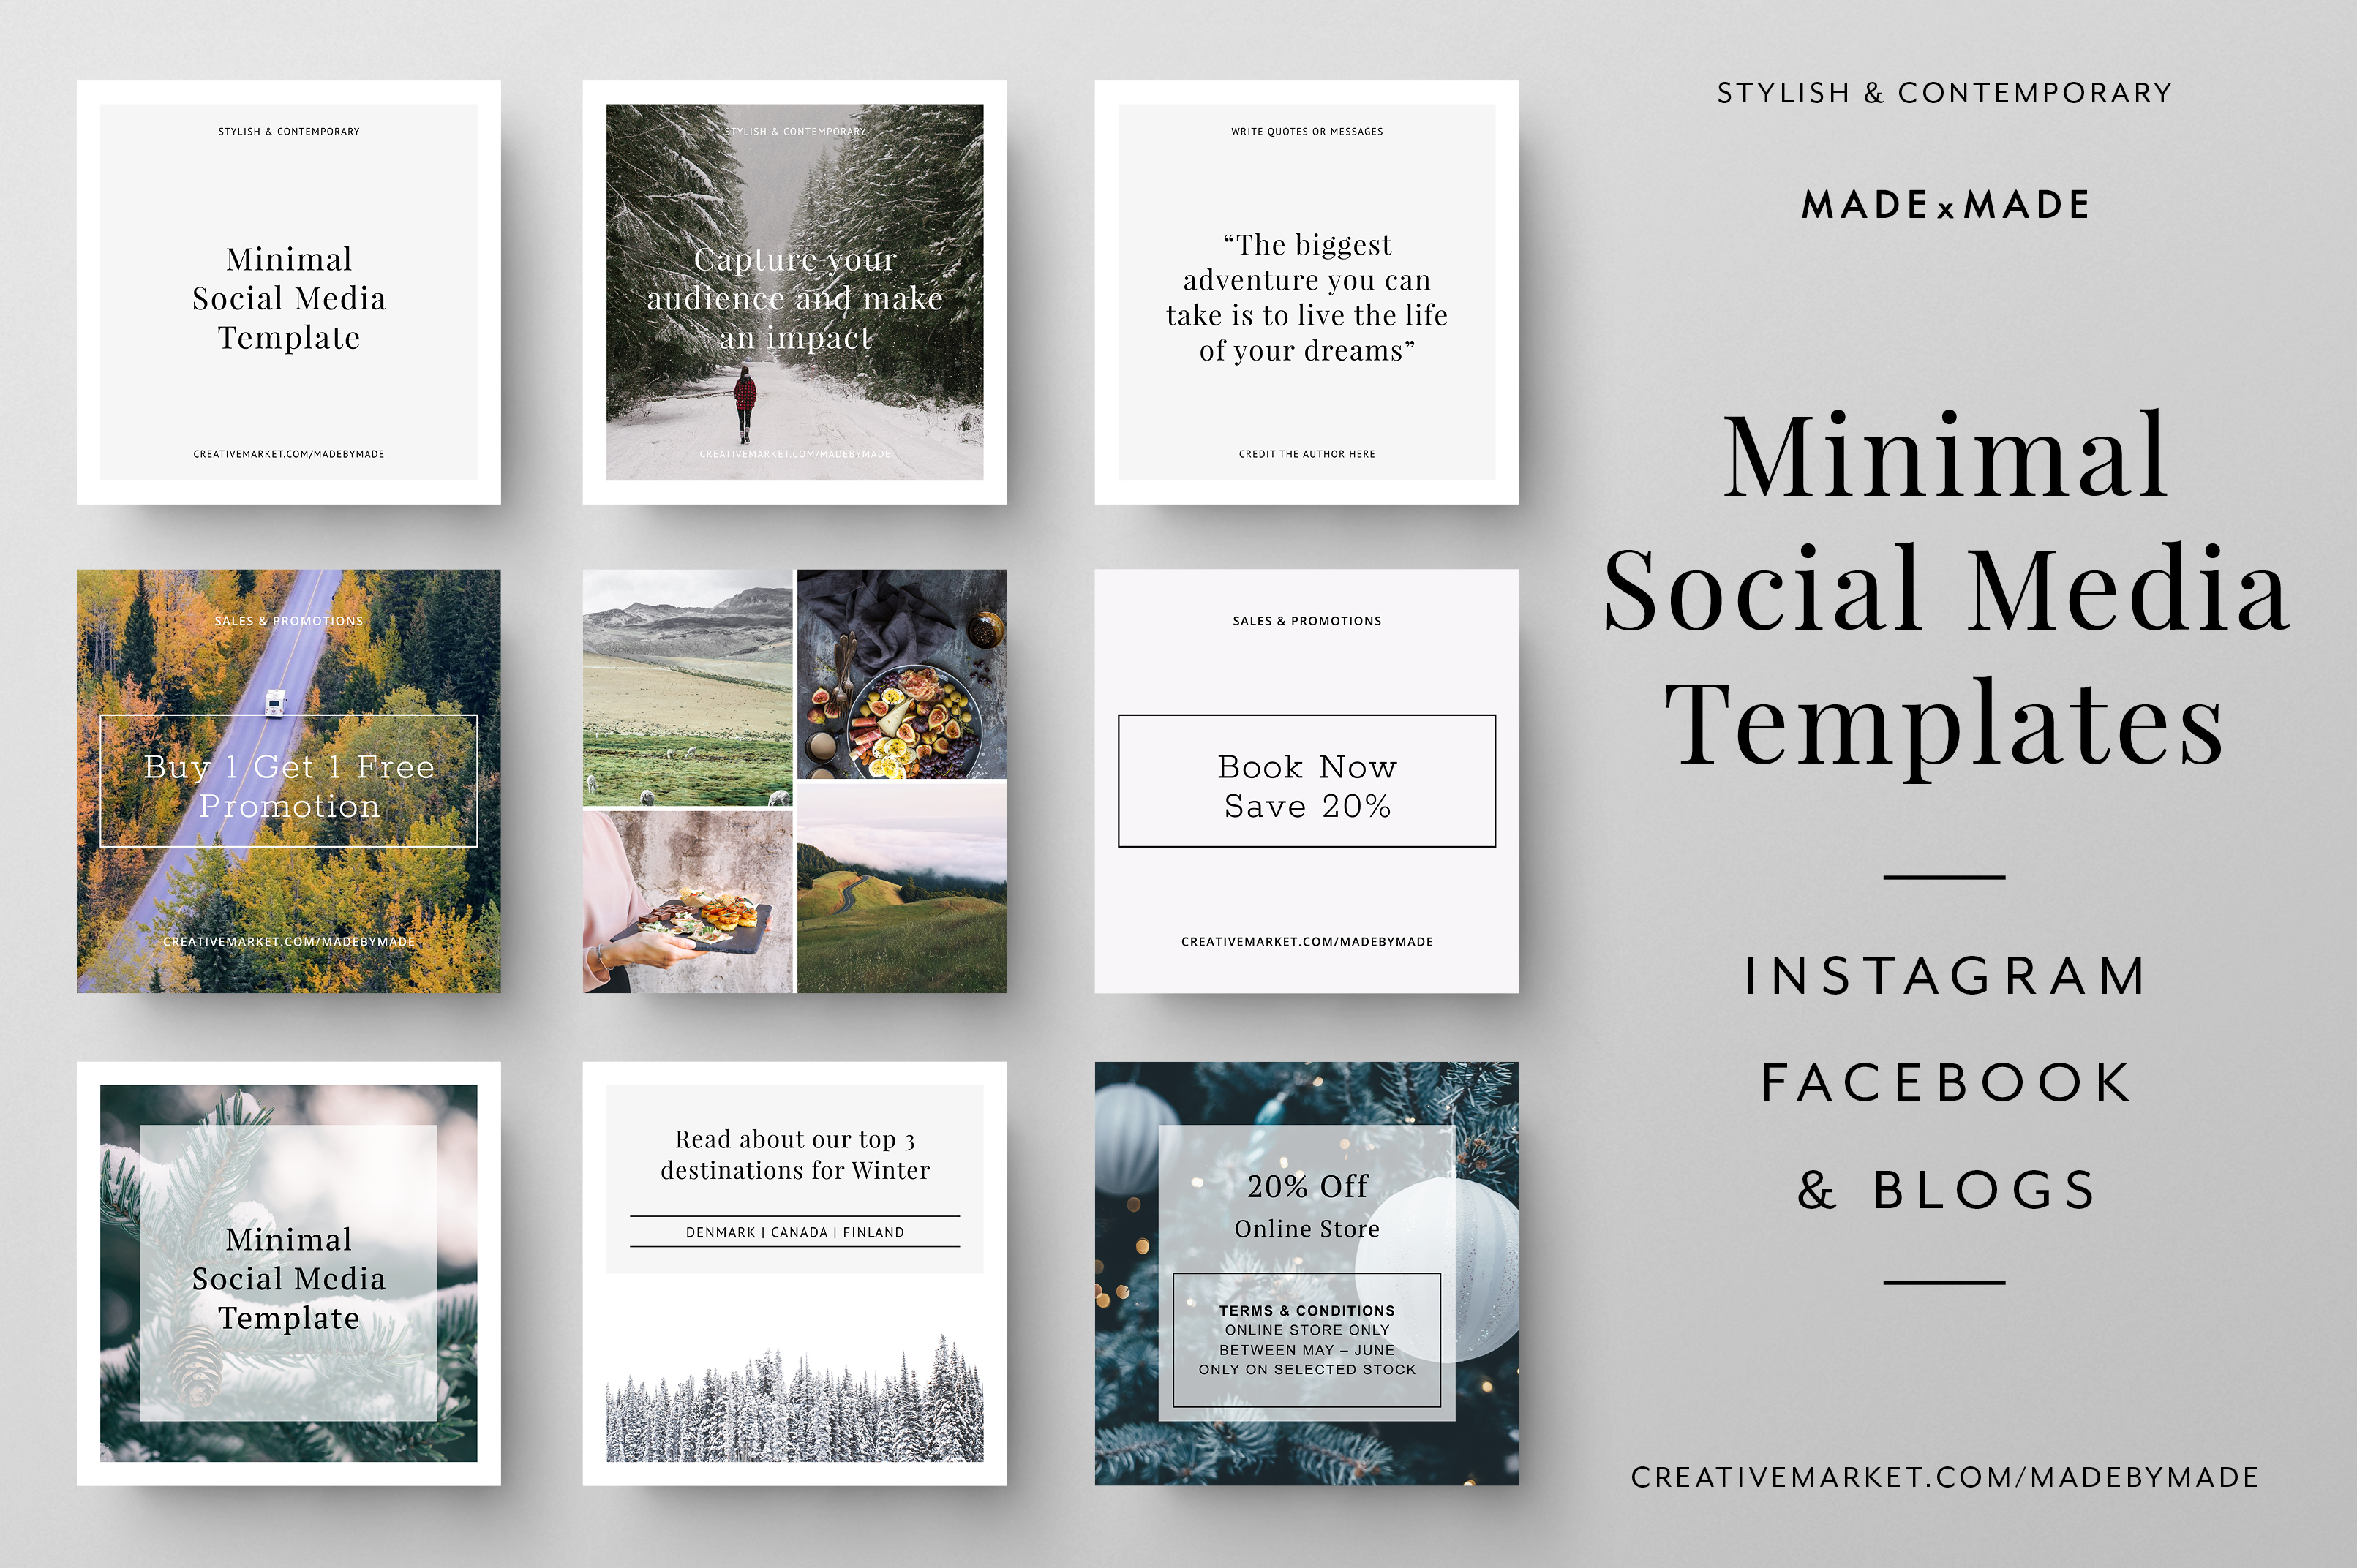 Minimal Social Media Templates example image 1